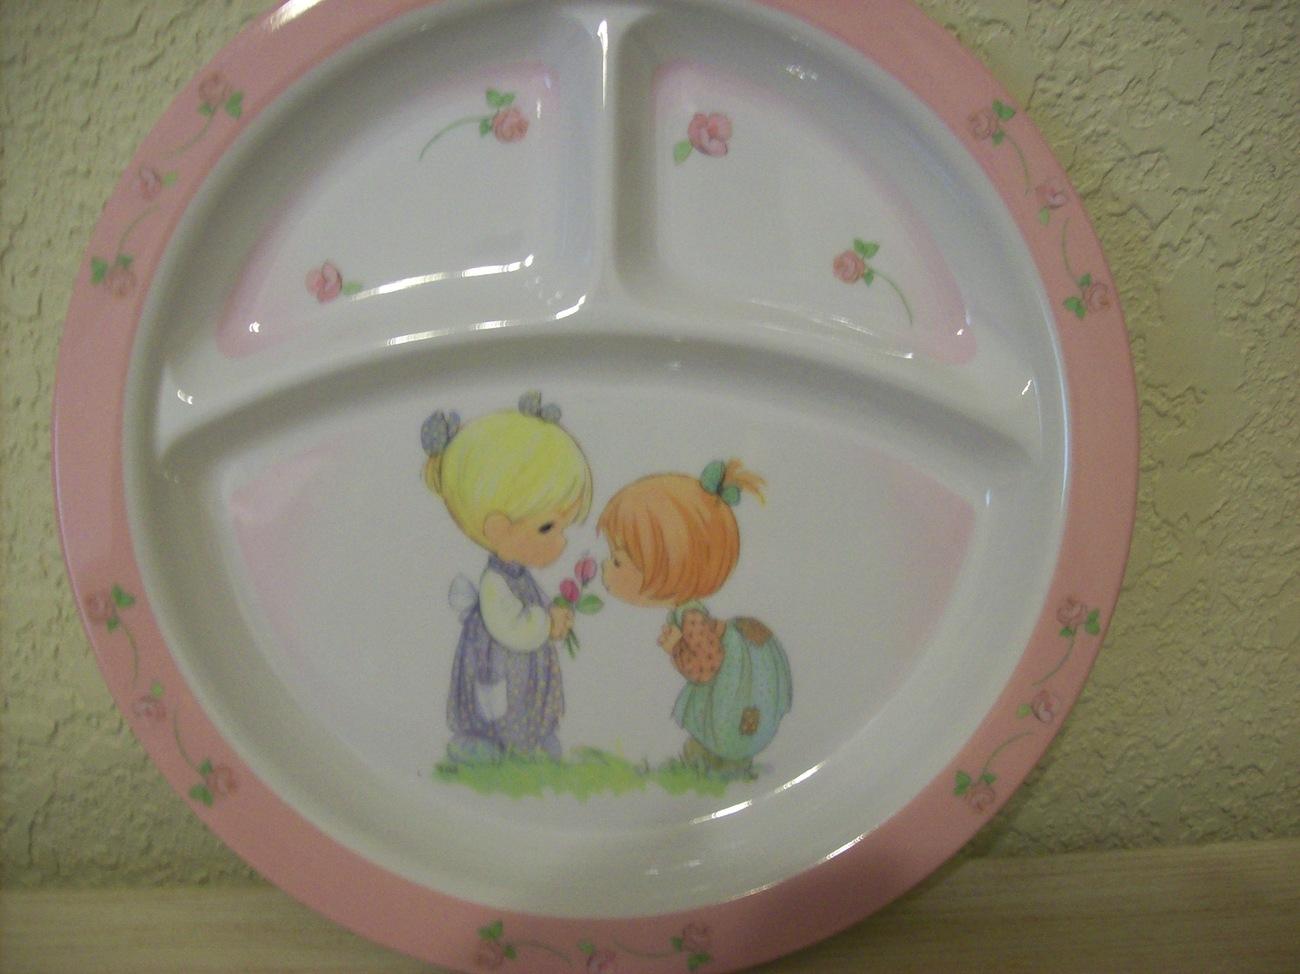 Precious Moments 2 pc. Children's Melamine Plates